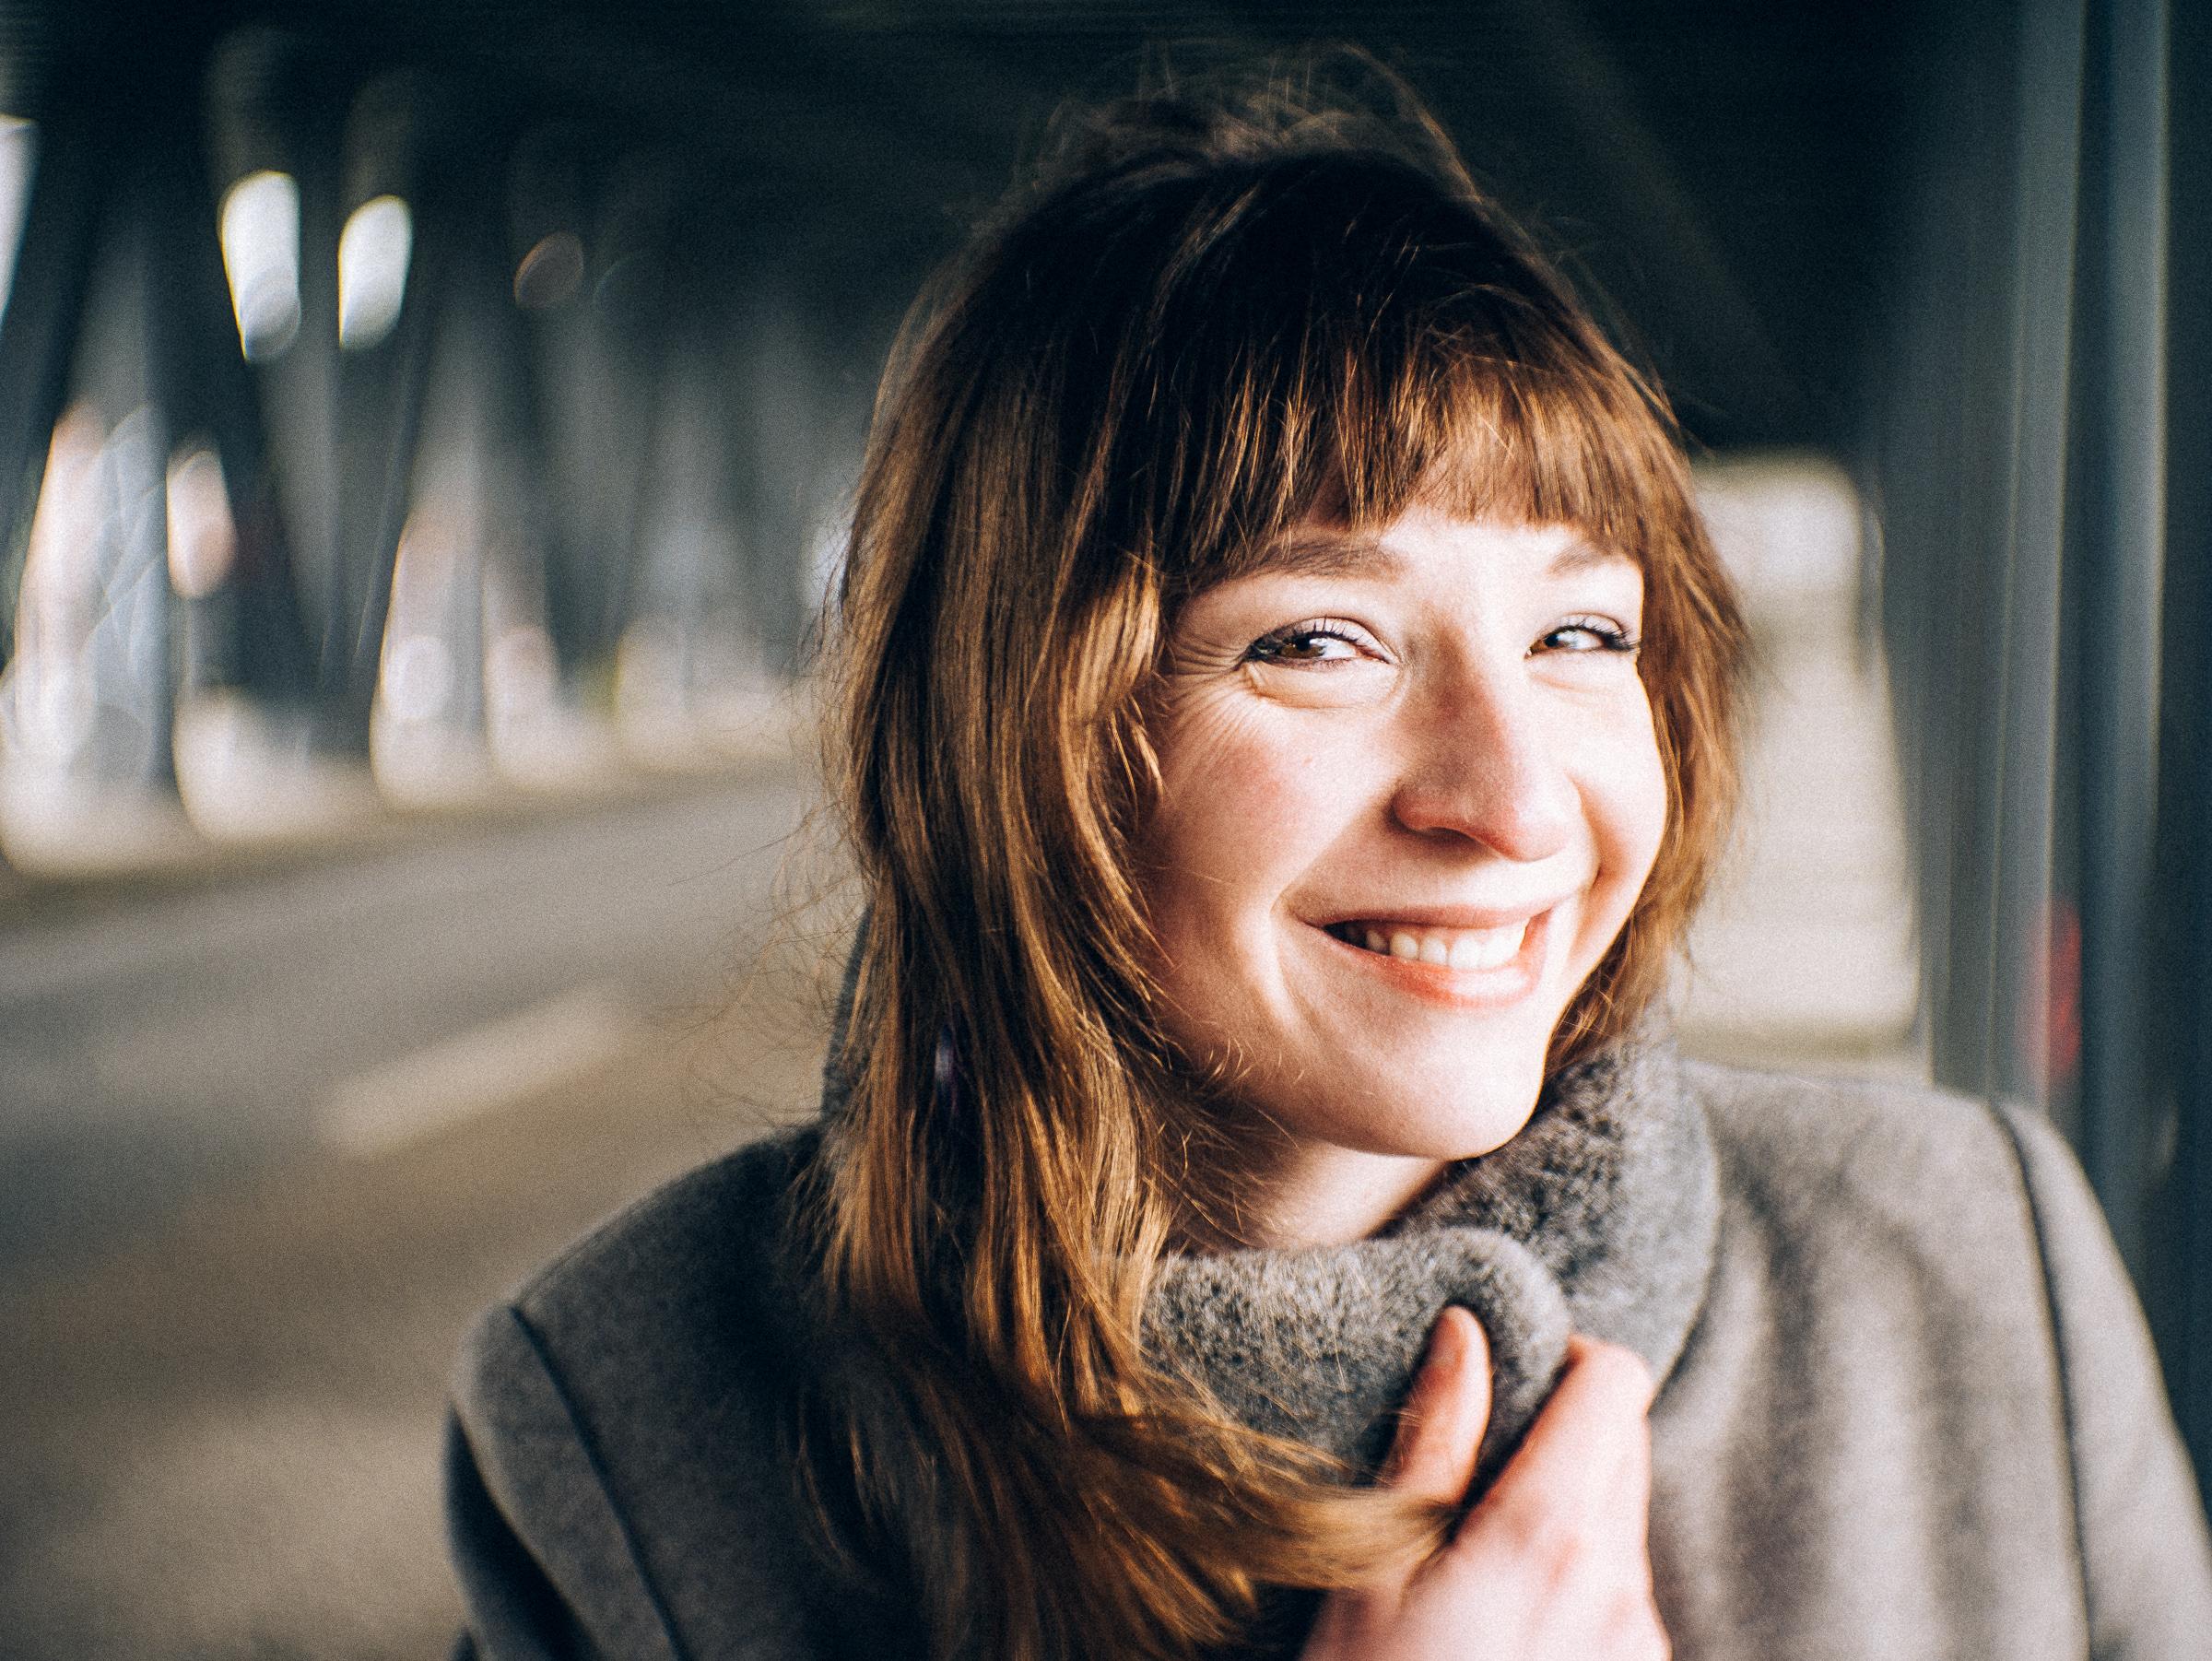 Johanna Hattner (by F.Janssen)